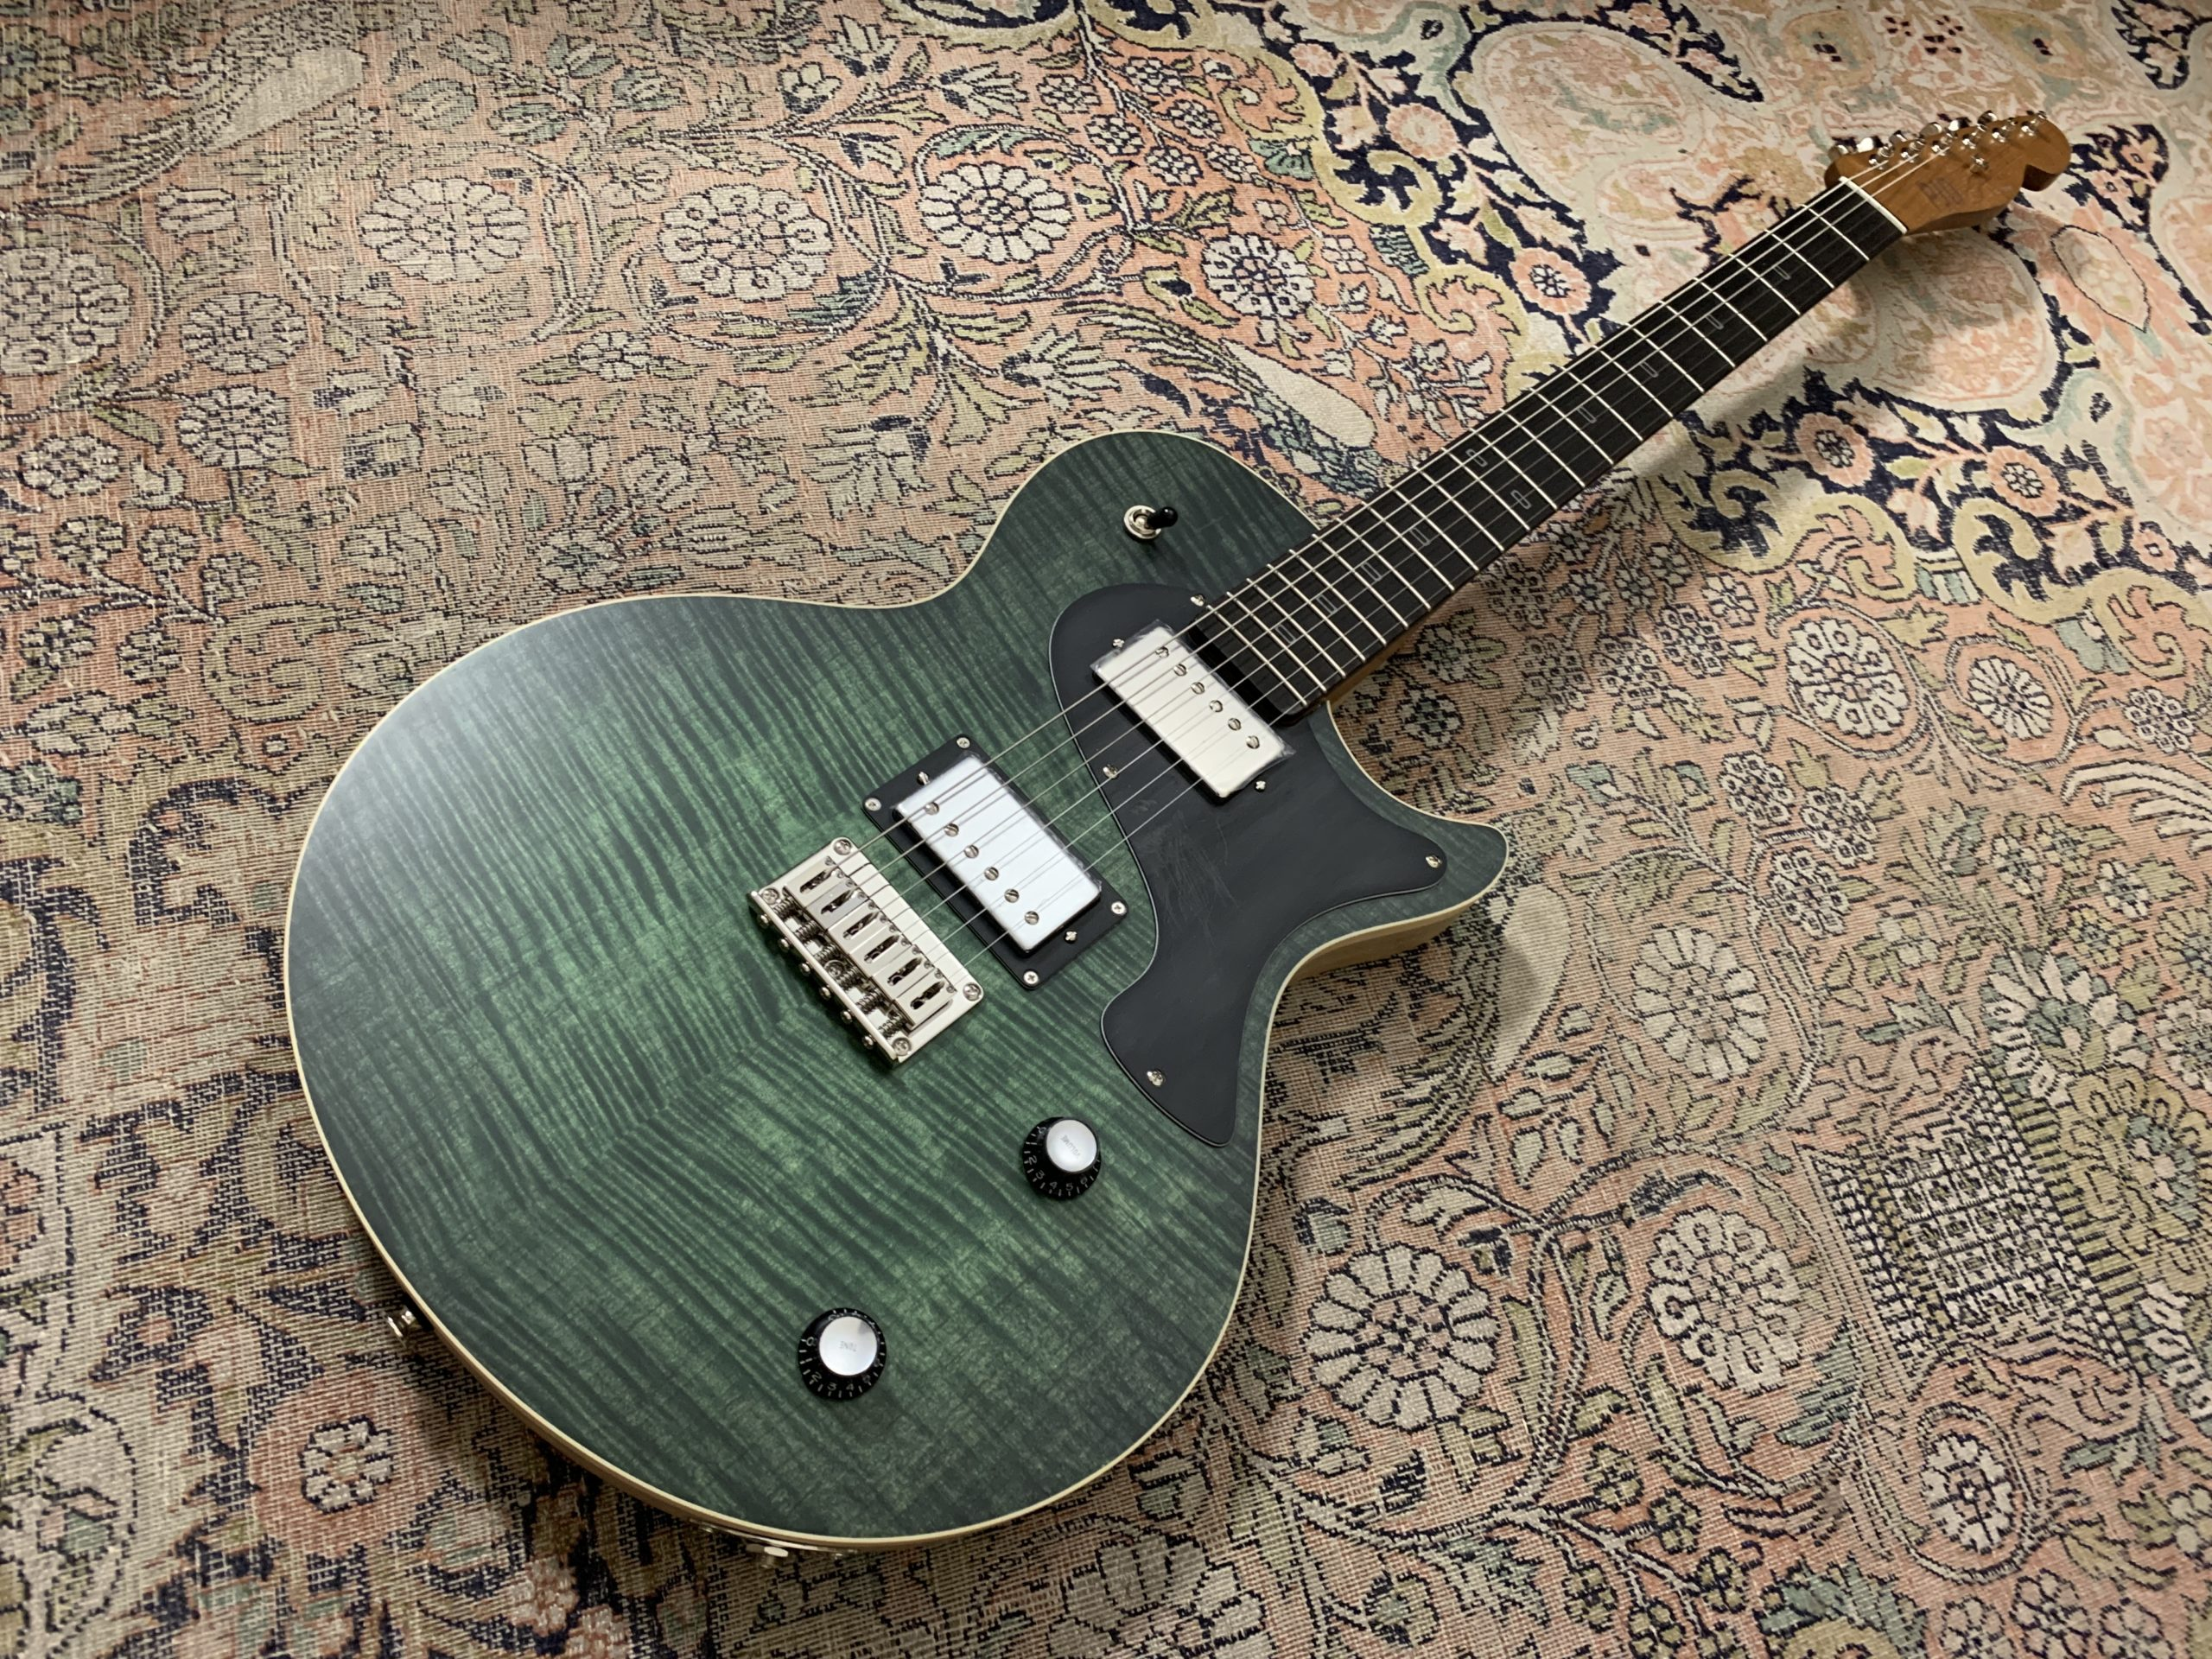 PJD Guitars Carey Elite, test de la belle anglaise, mi Les Paul, mi Telecaster